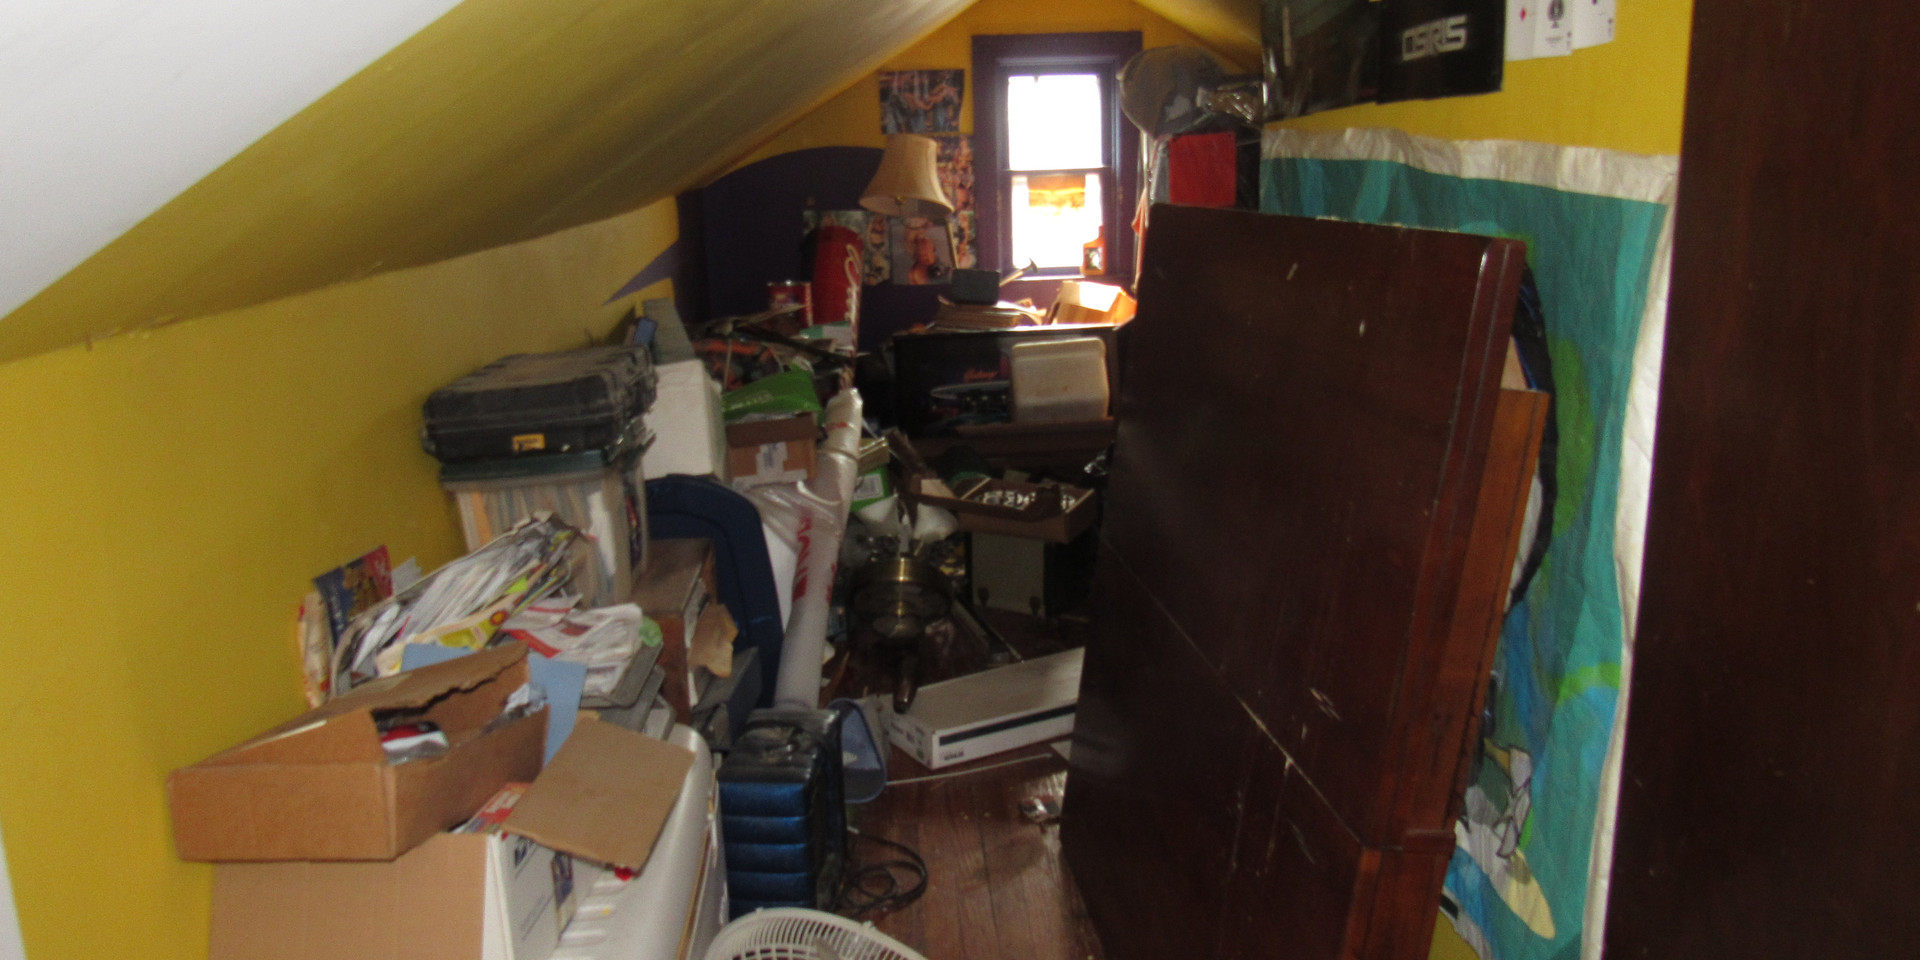 31 - Bedroom 3.JPG